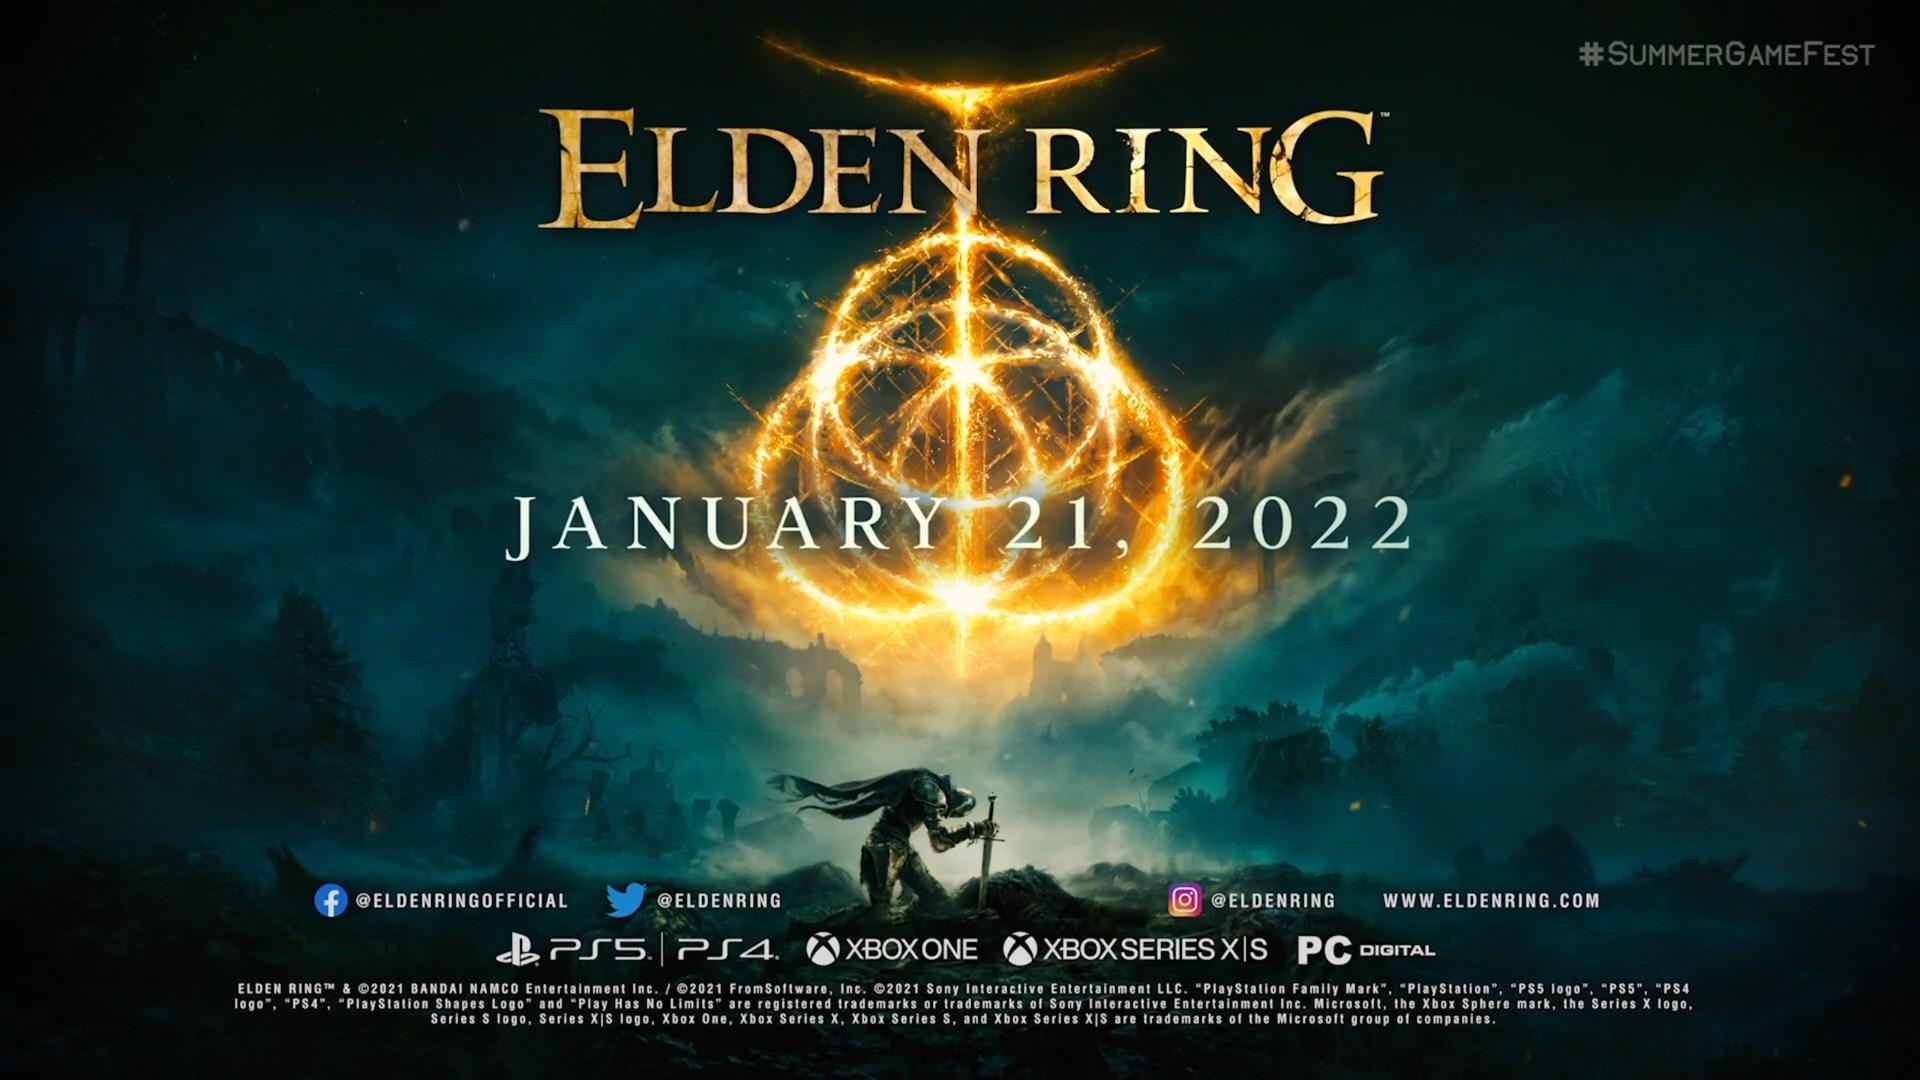 Elden Ring release date revealed at Summer Game Fest